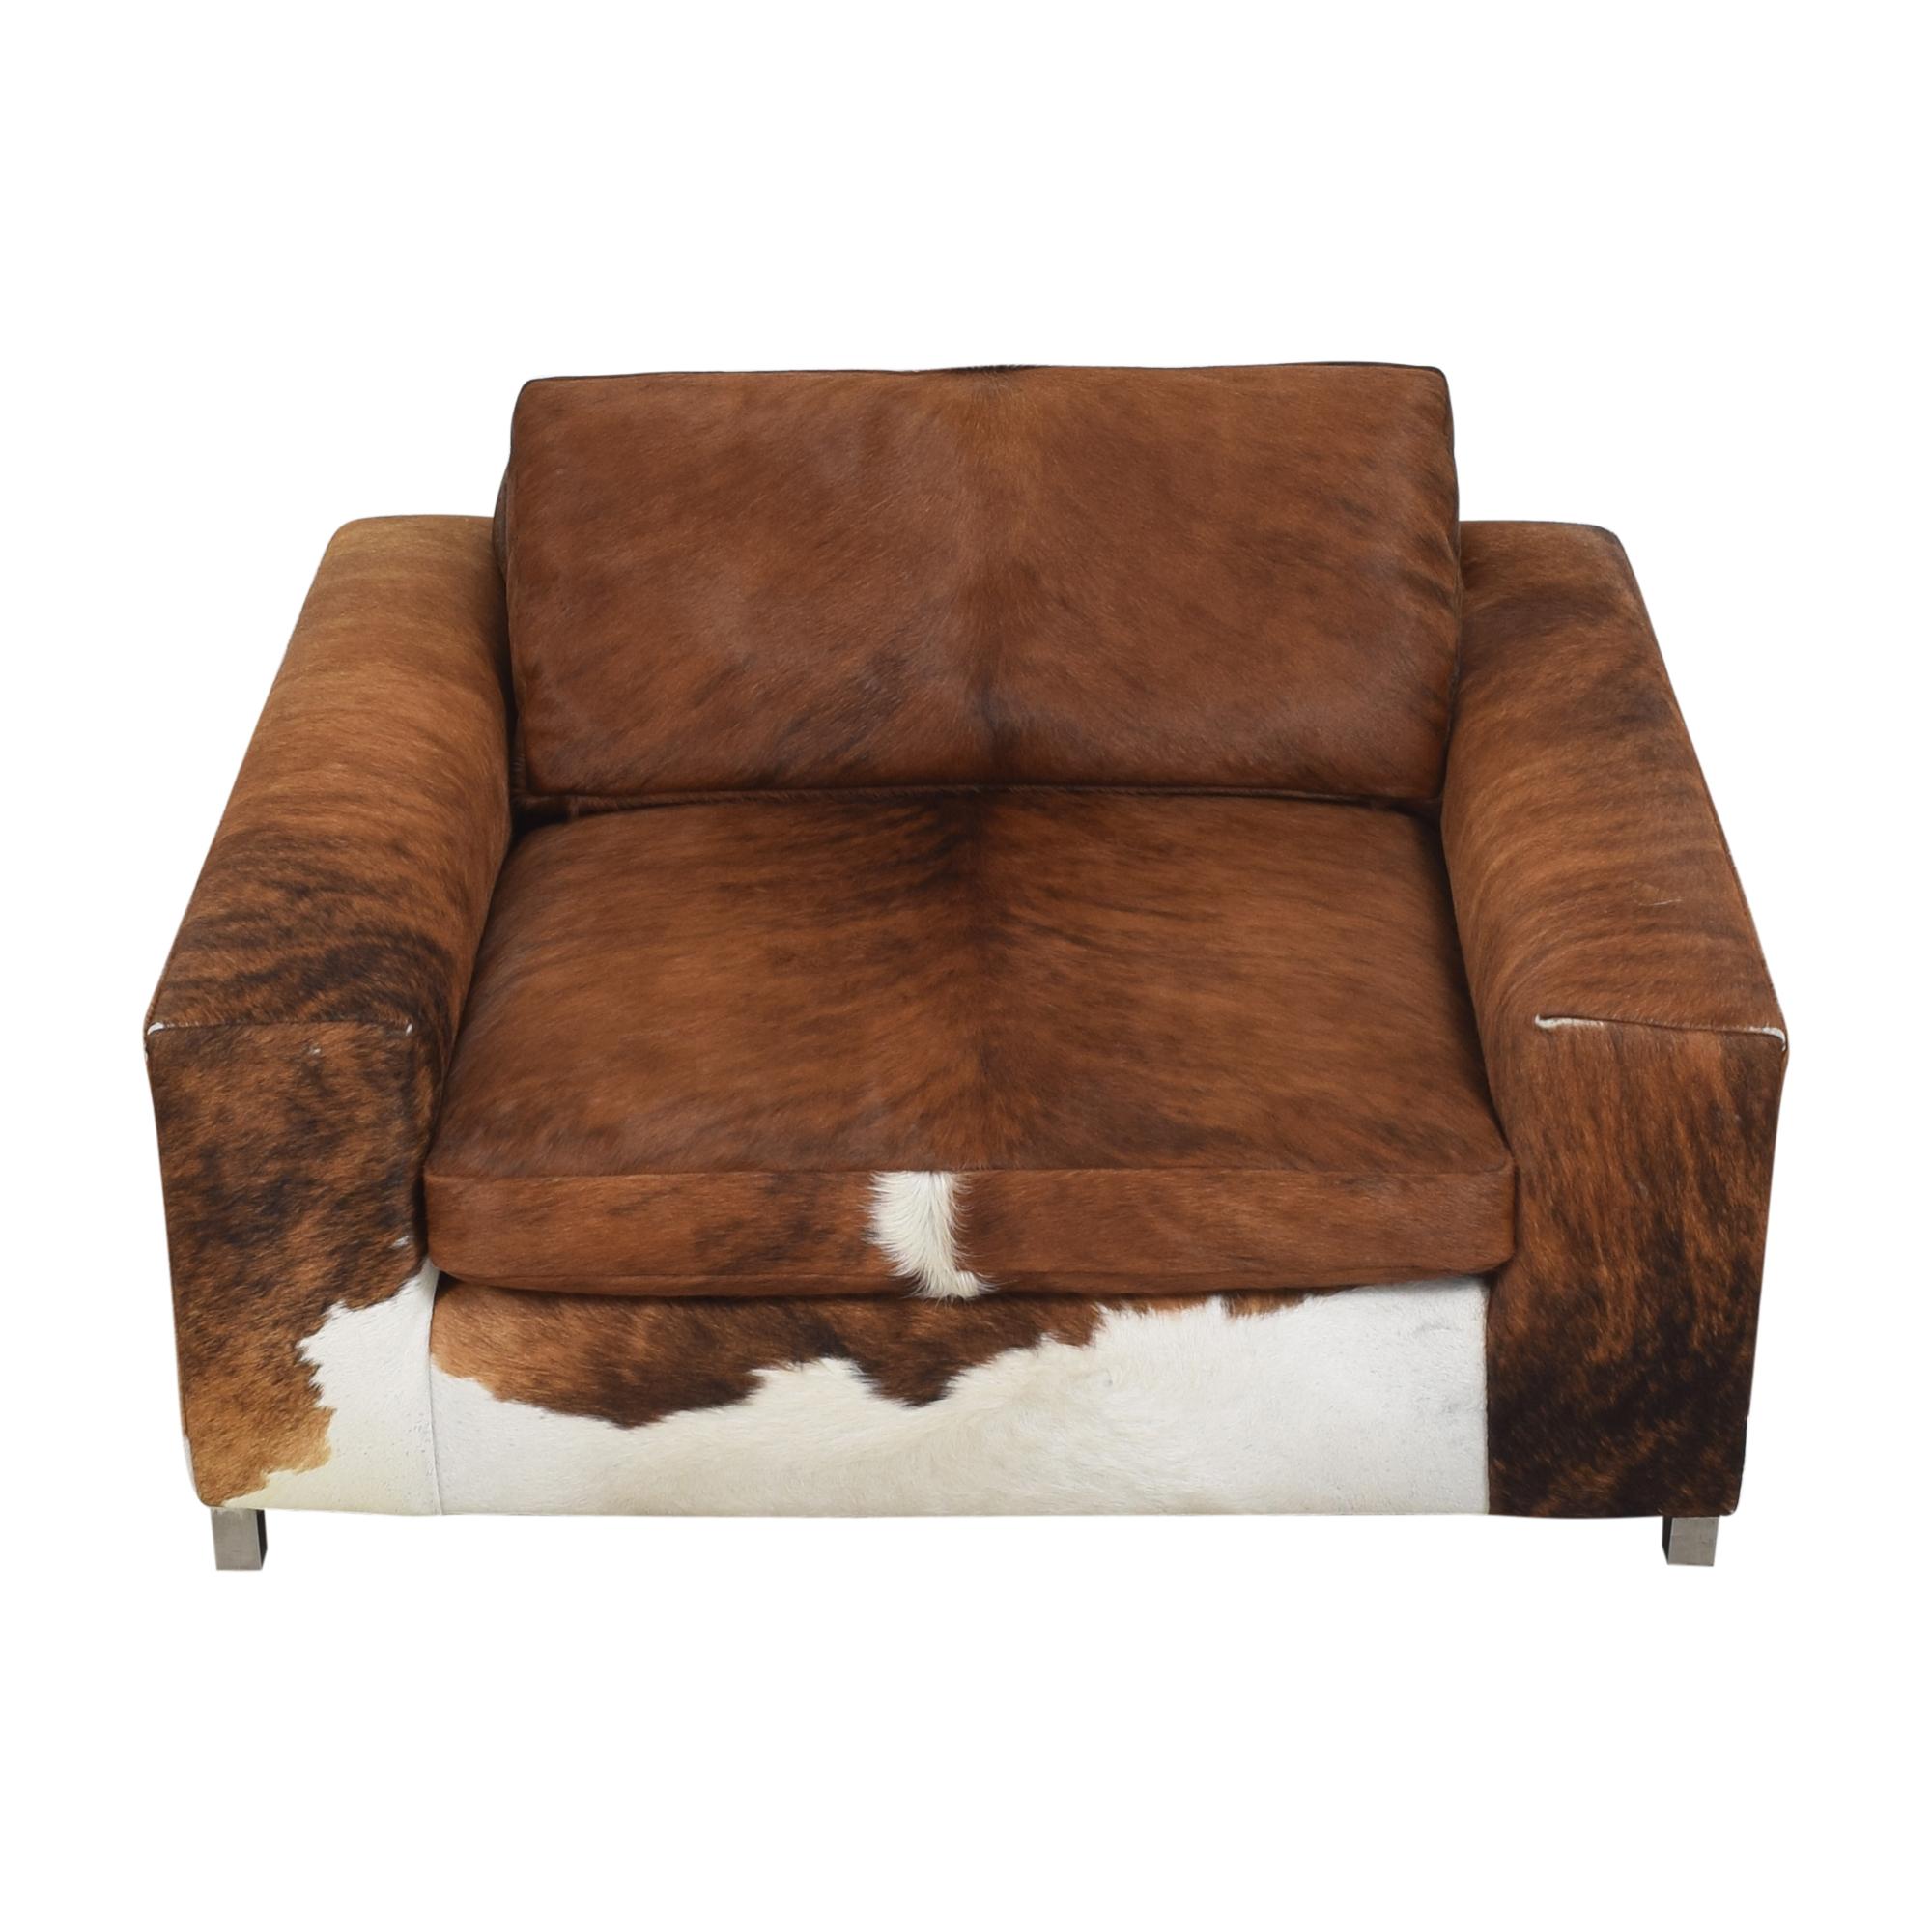 Room & Board Custom Room & Board Hide Lounge Chair ma